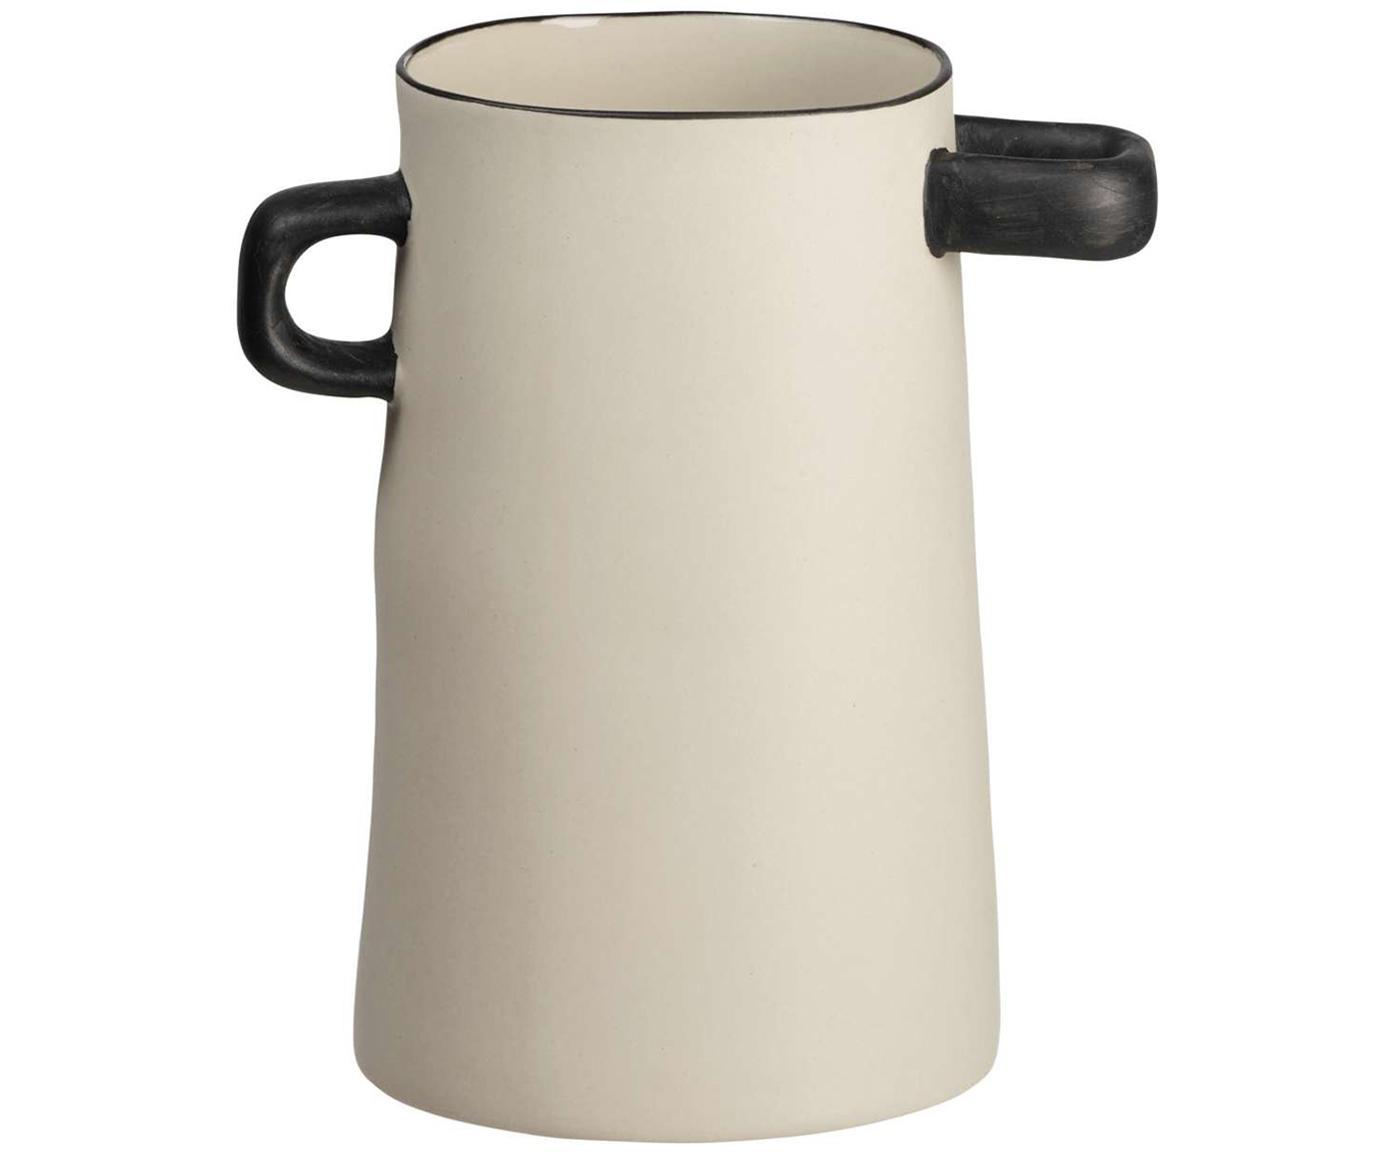 Vaso fatto a mano Rayu, Terracotta, Beige, nero, Ø 11 x Alt. 17 cm